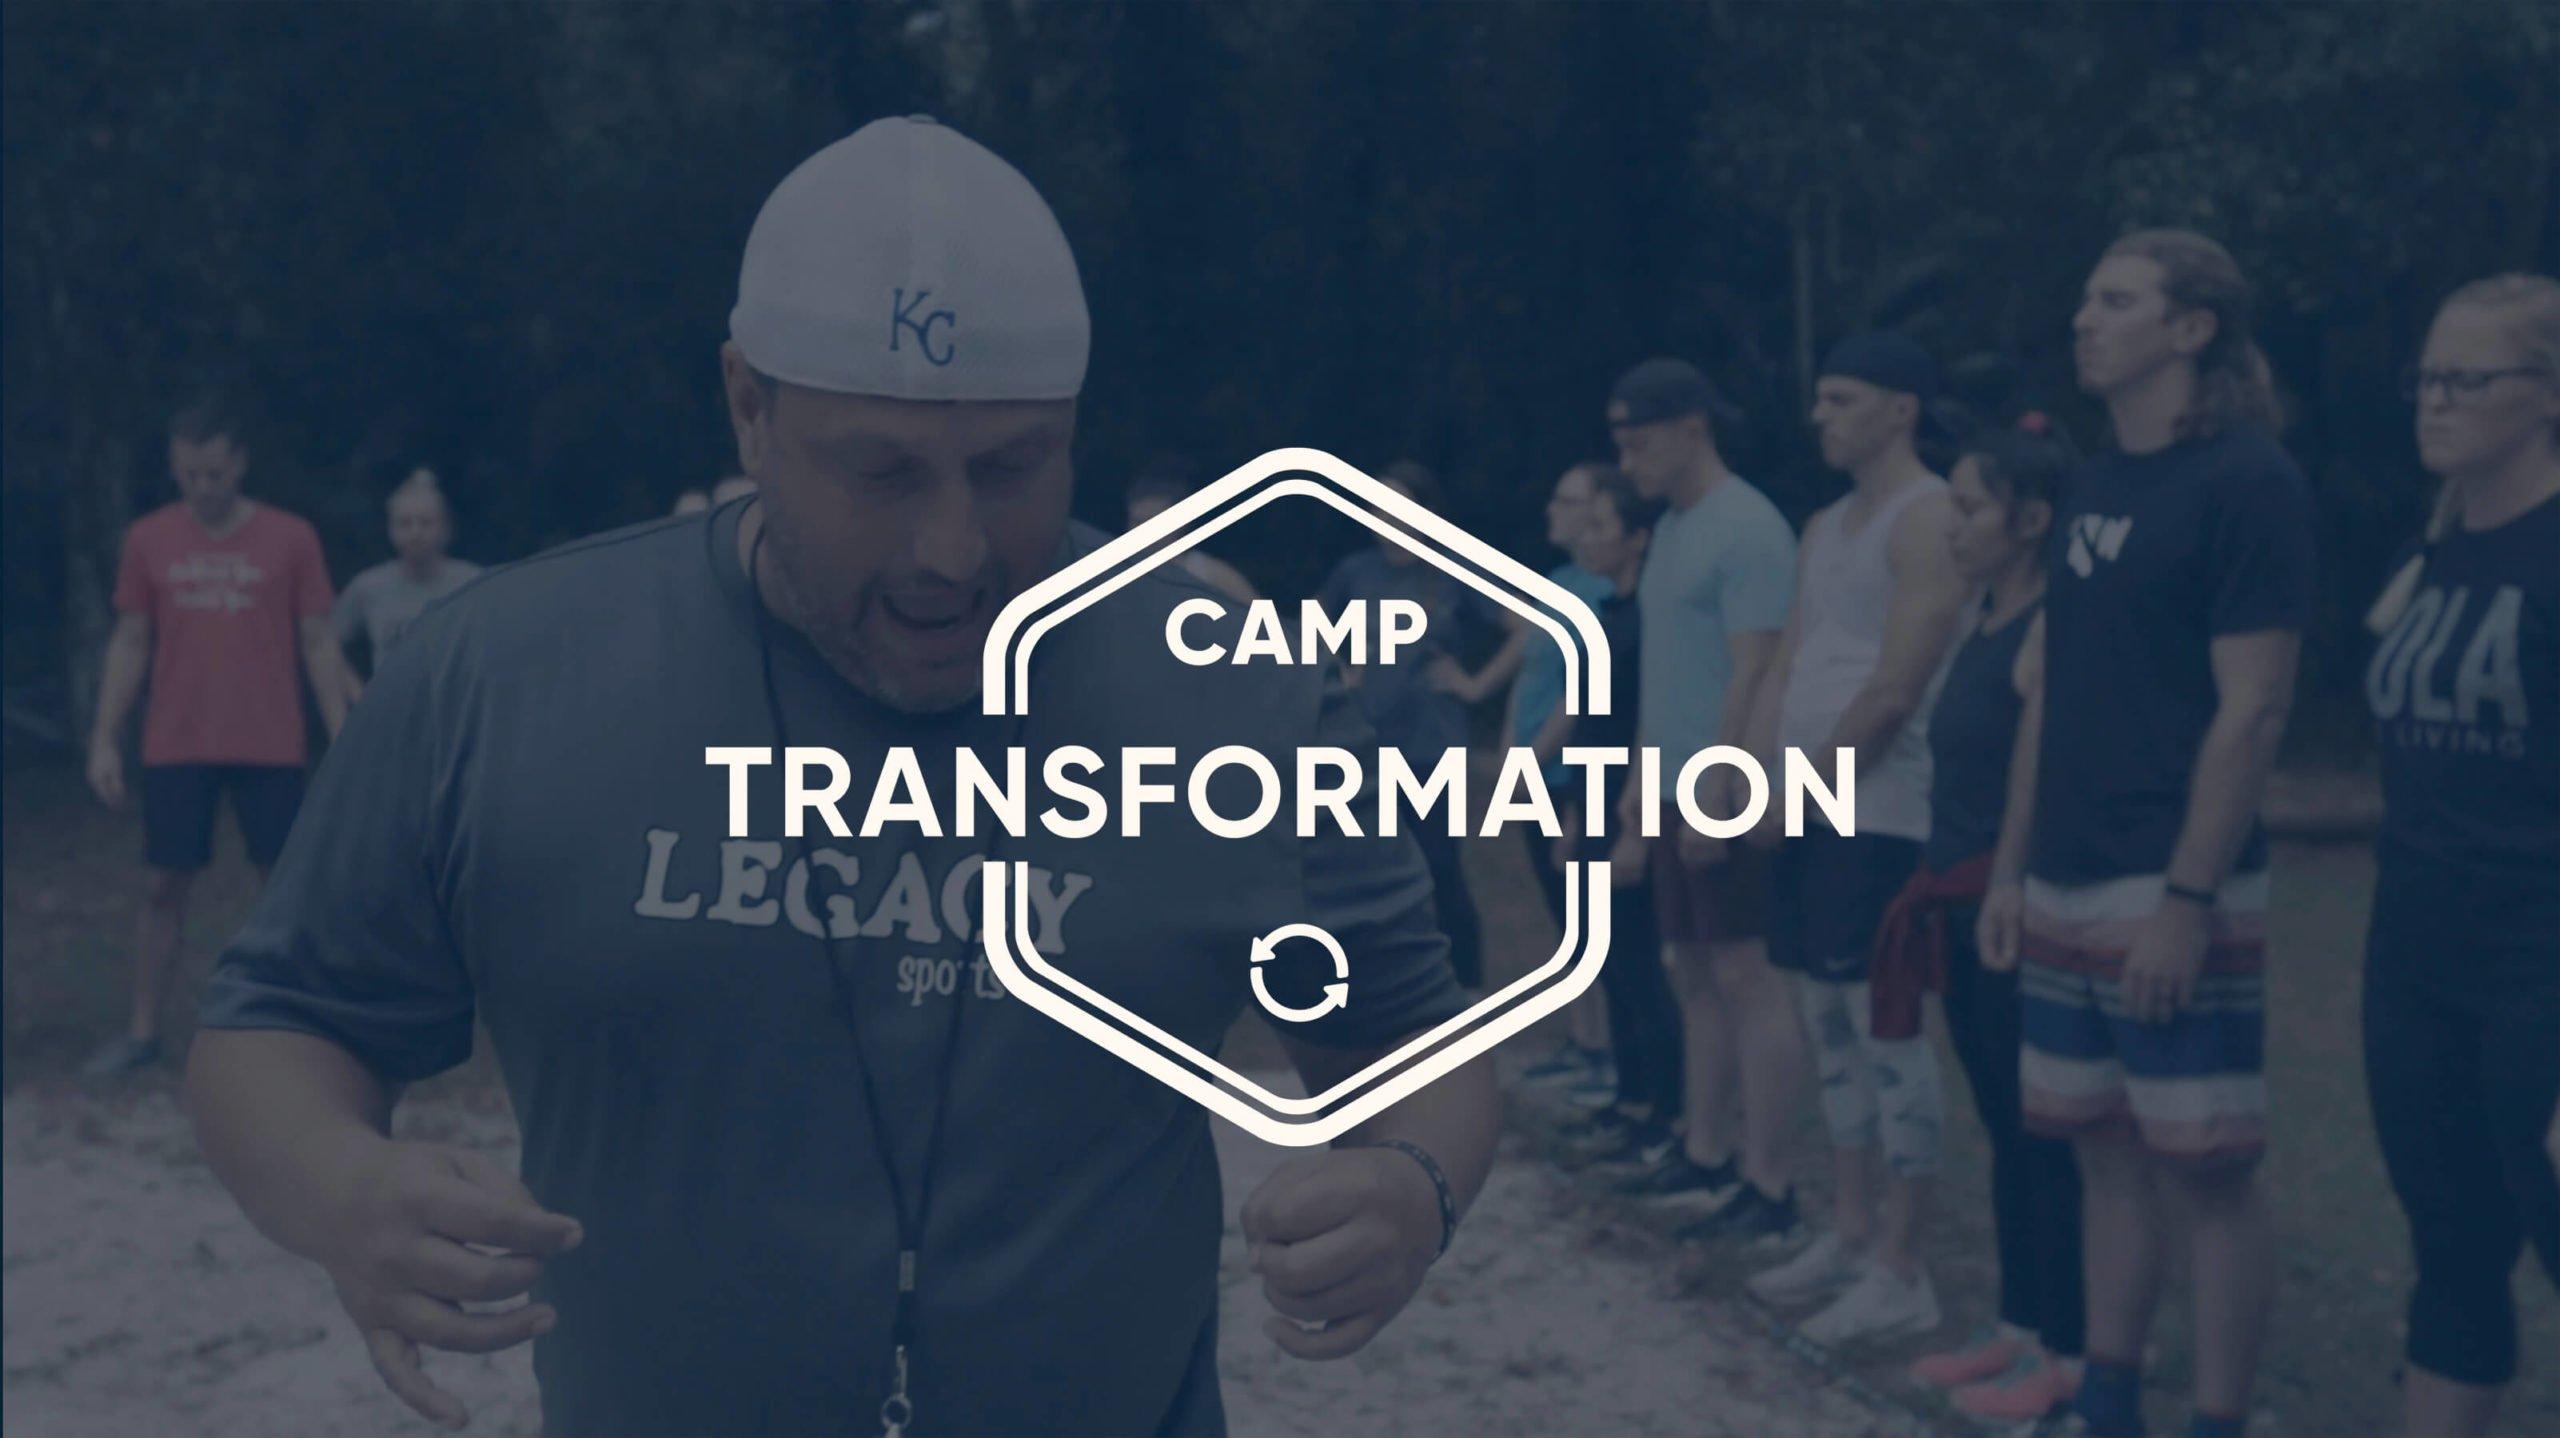 Camp Transformation